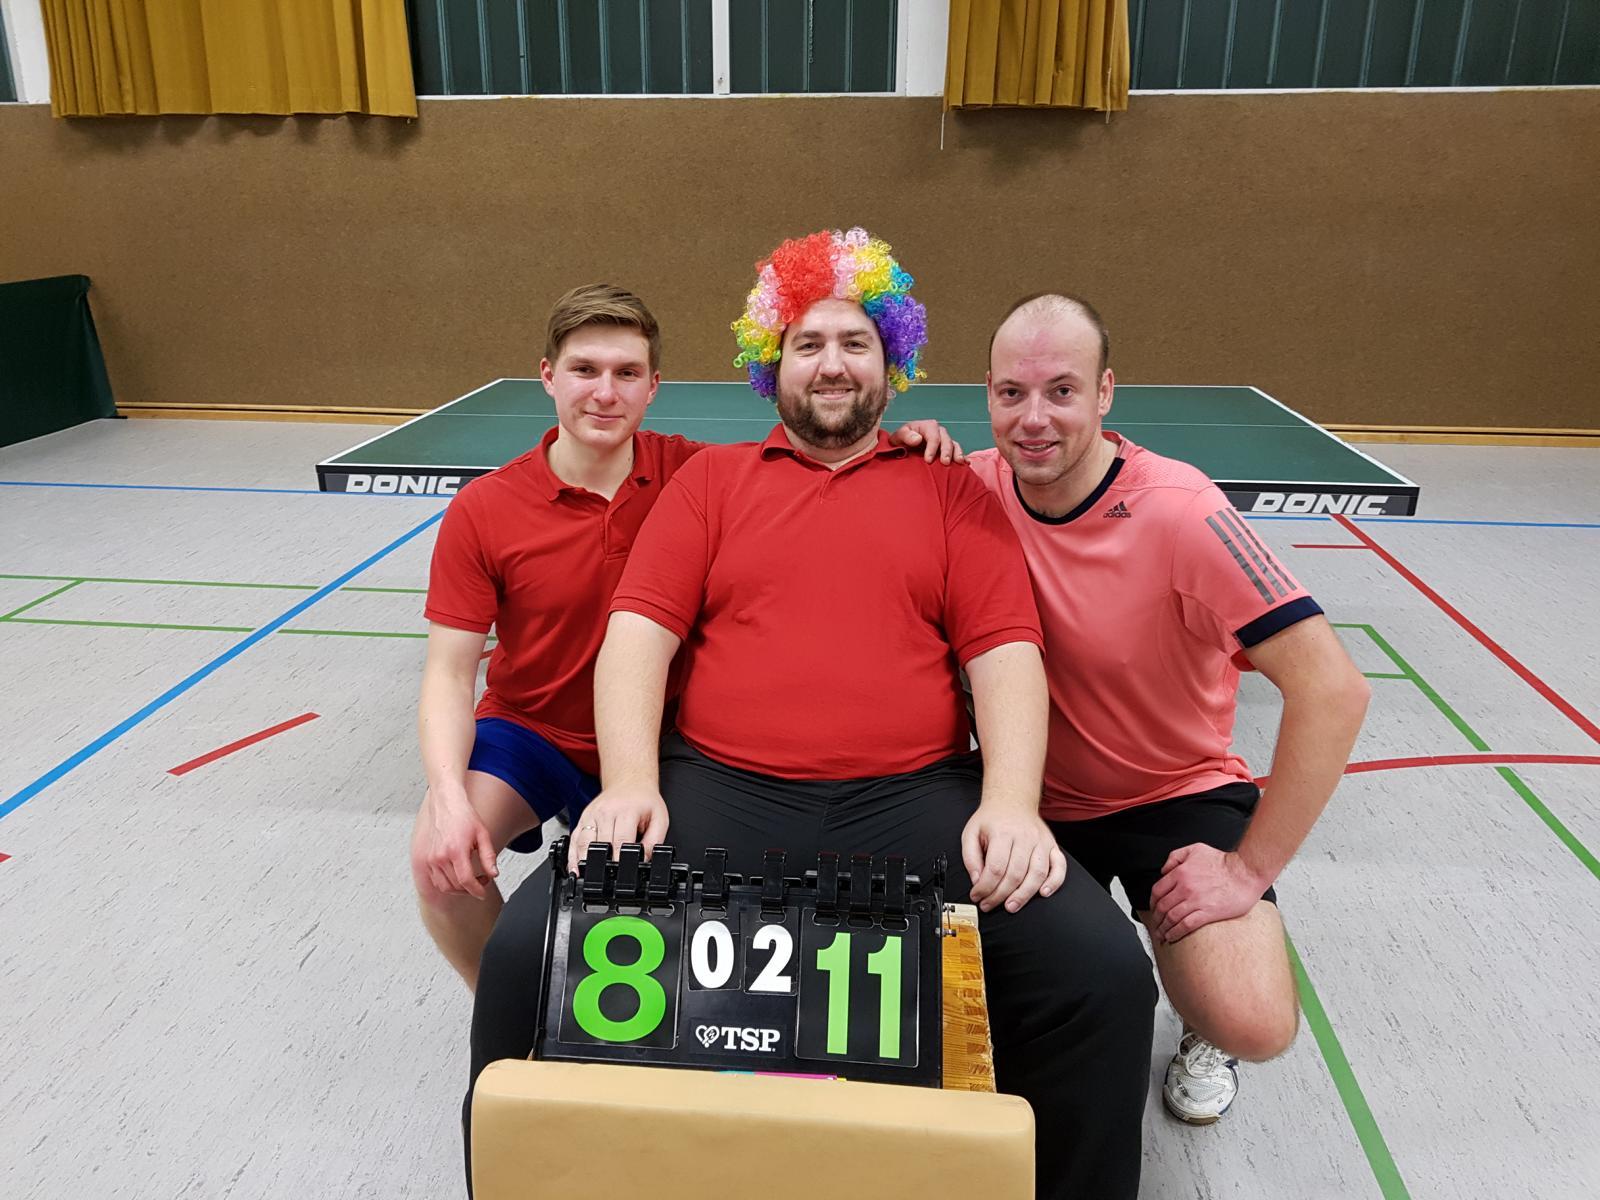 Erfolgreiche Marienloher Turniercrew: (v.l.) Dominik Fischer, Igor Berger, Jens Burre